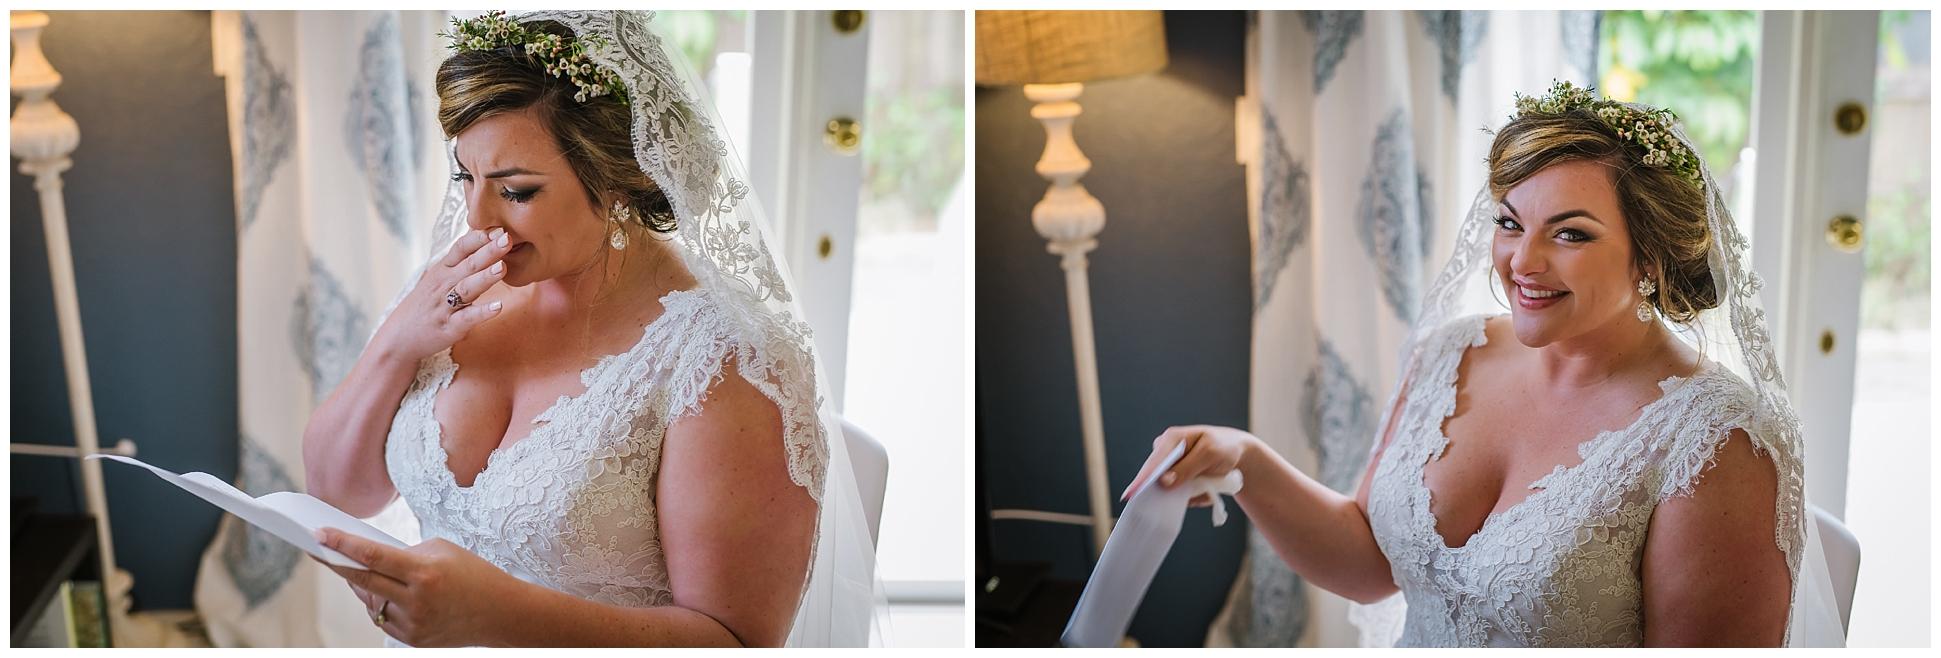 st-pete-wedding-photographer-italian-romance-theme-rustic-flower-crown_0384.jpg